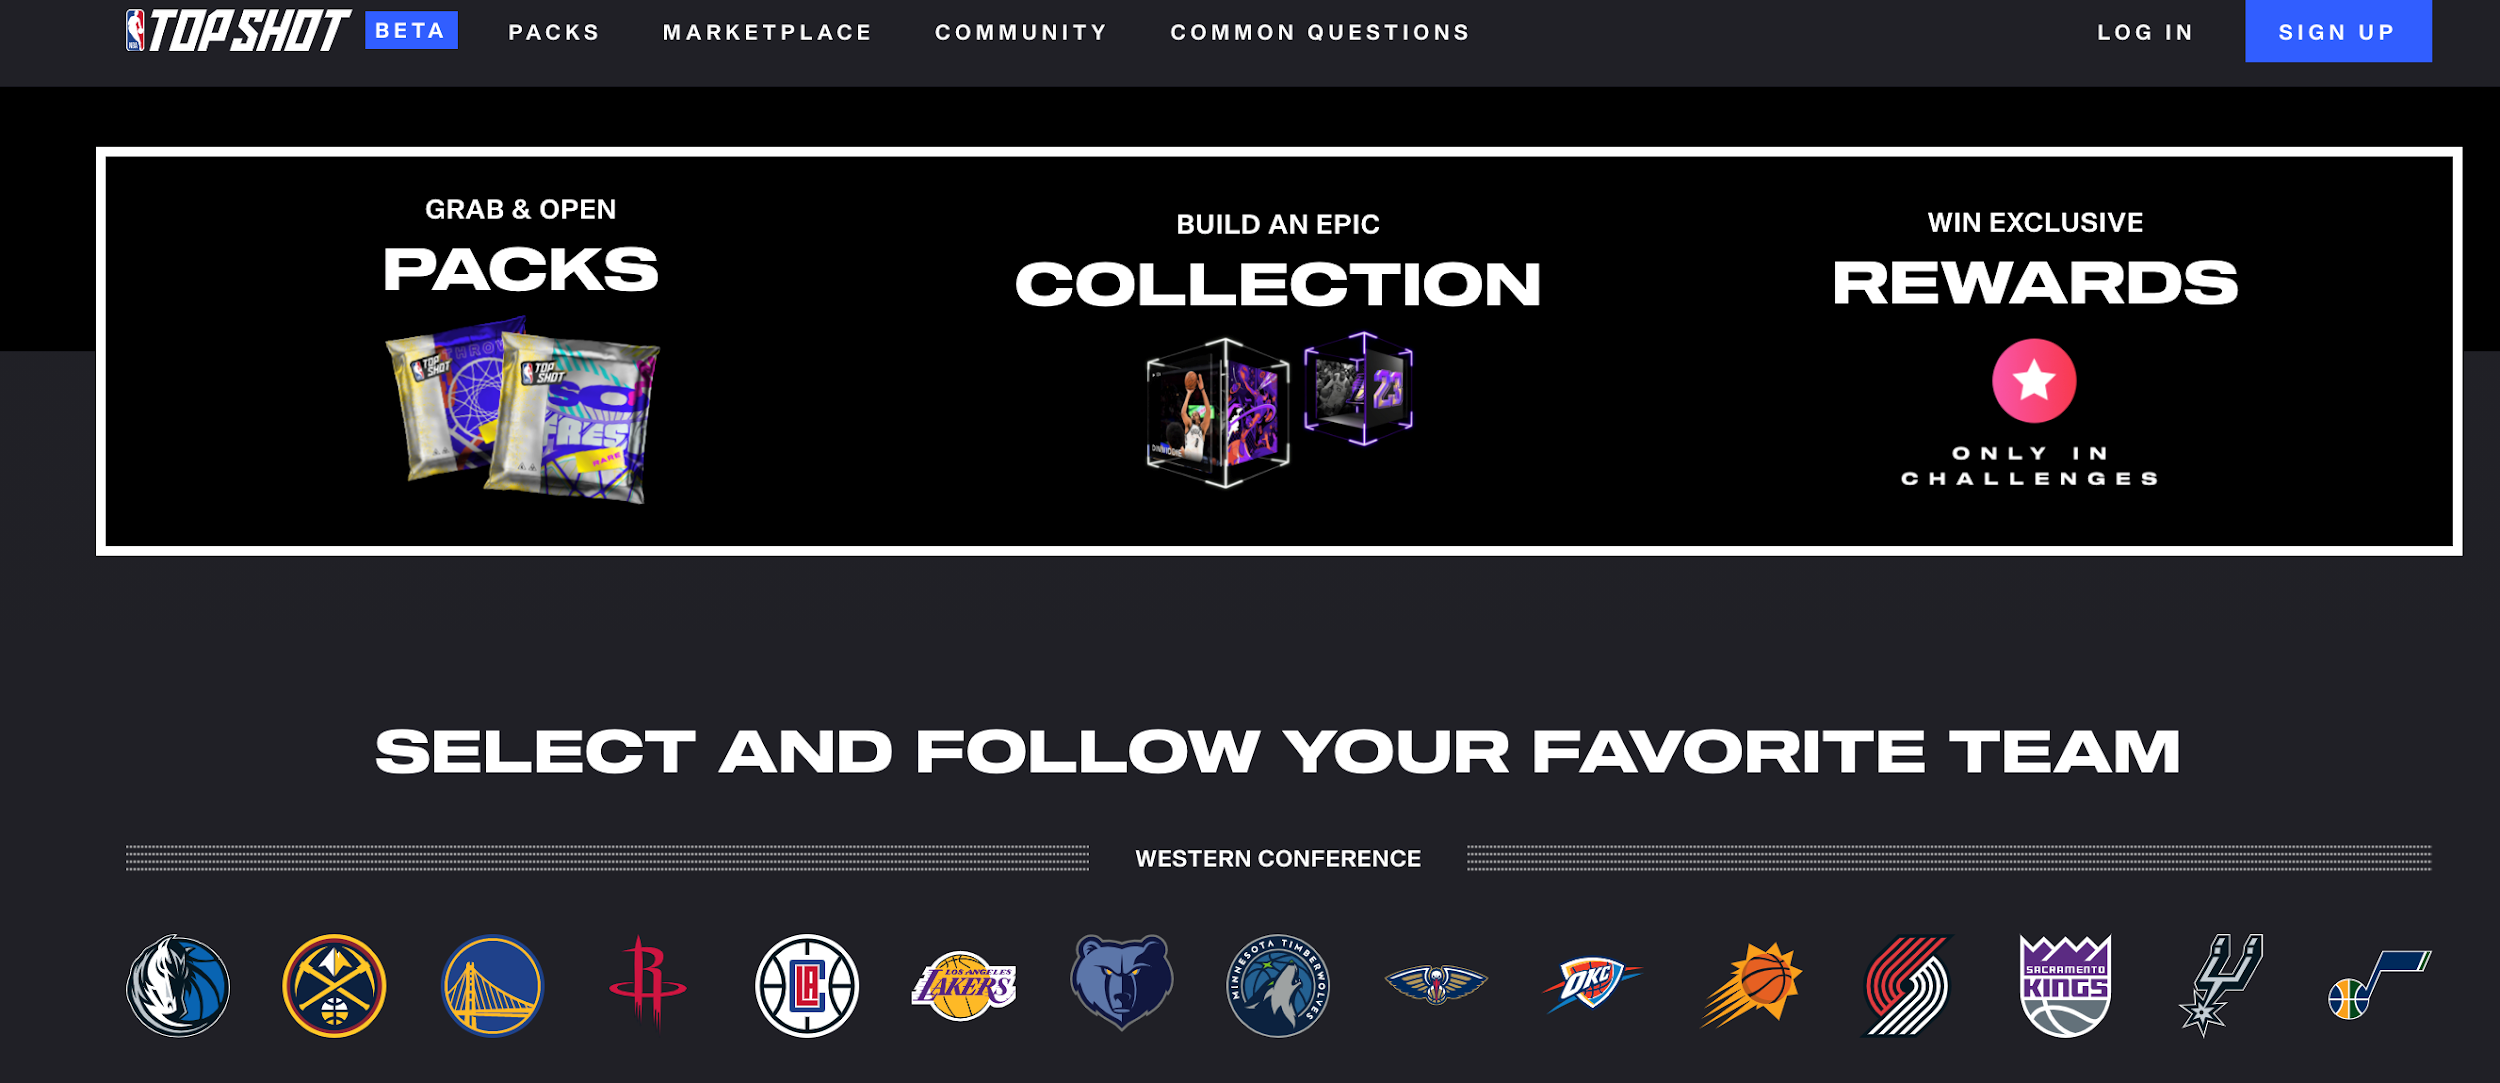 NBA Top Shot Marketplace General Layout